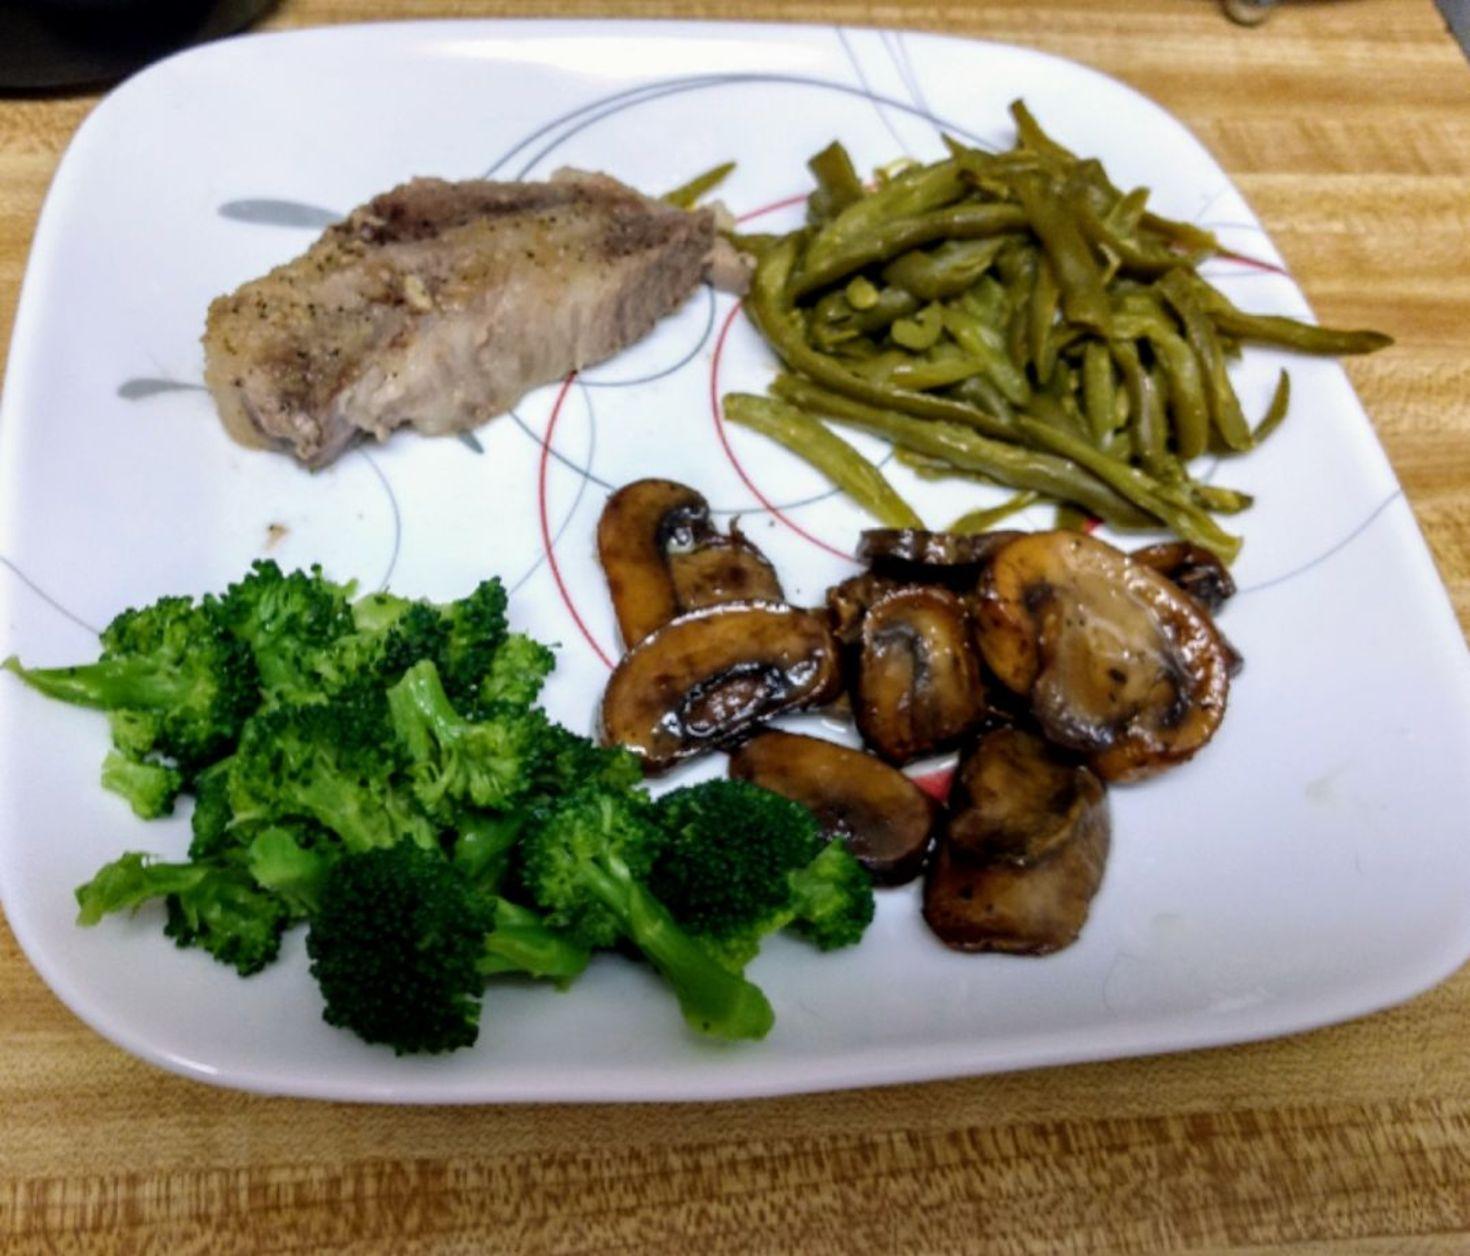 Garlic Seasoned Baked Pork Chops Kristina Marie Walker